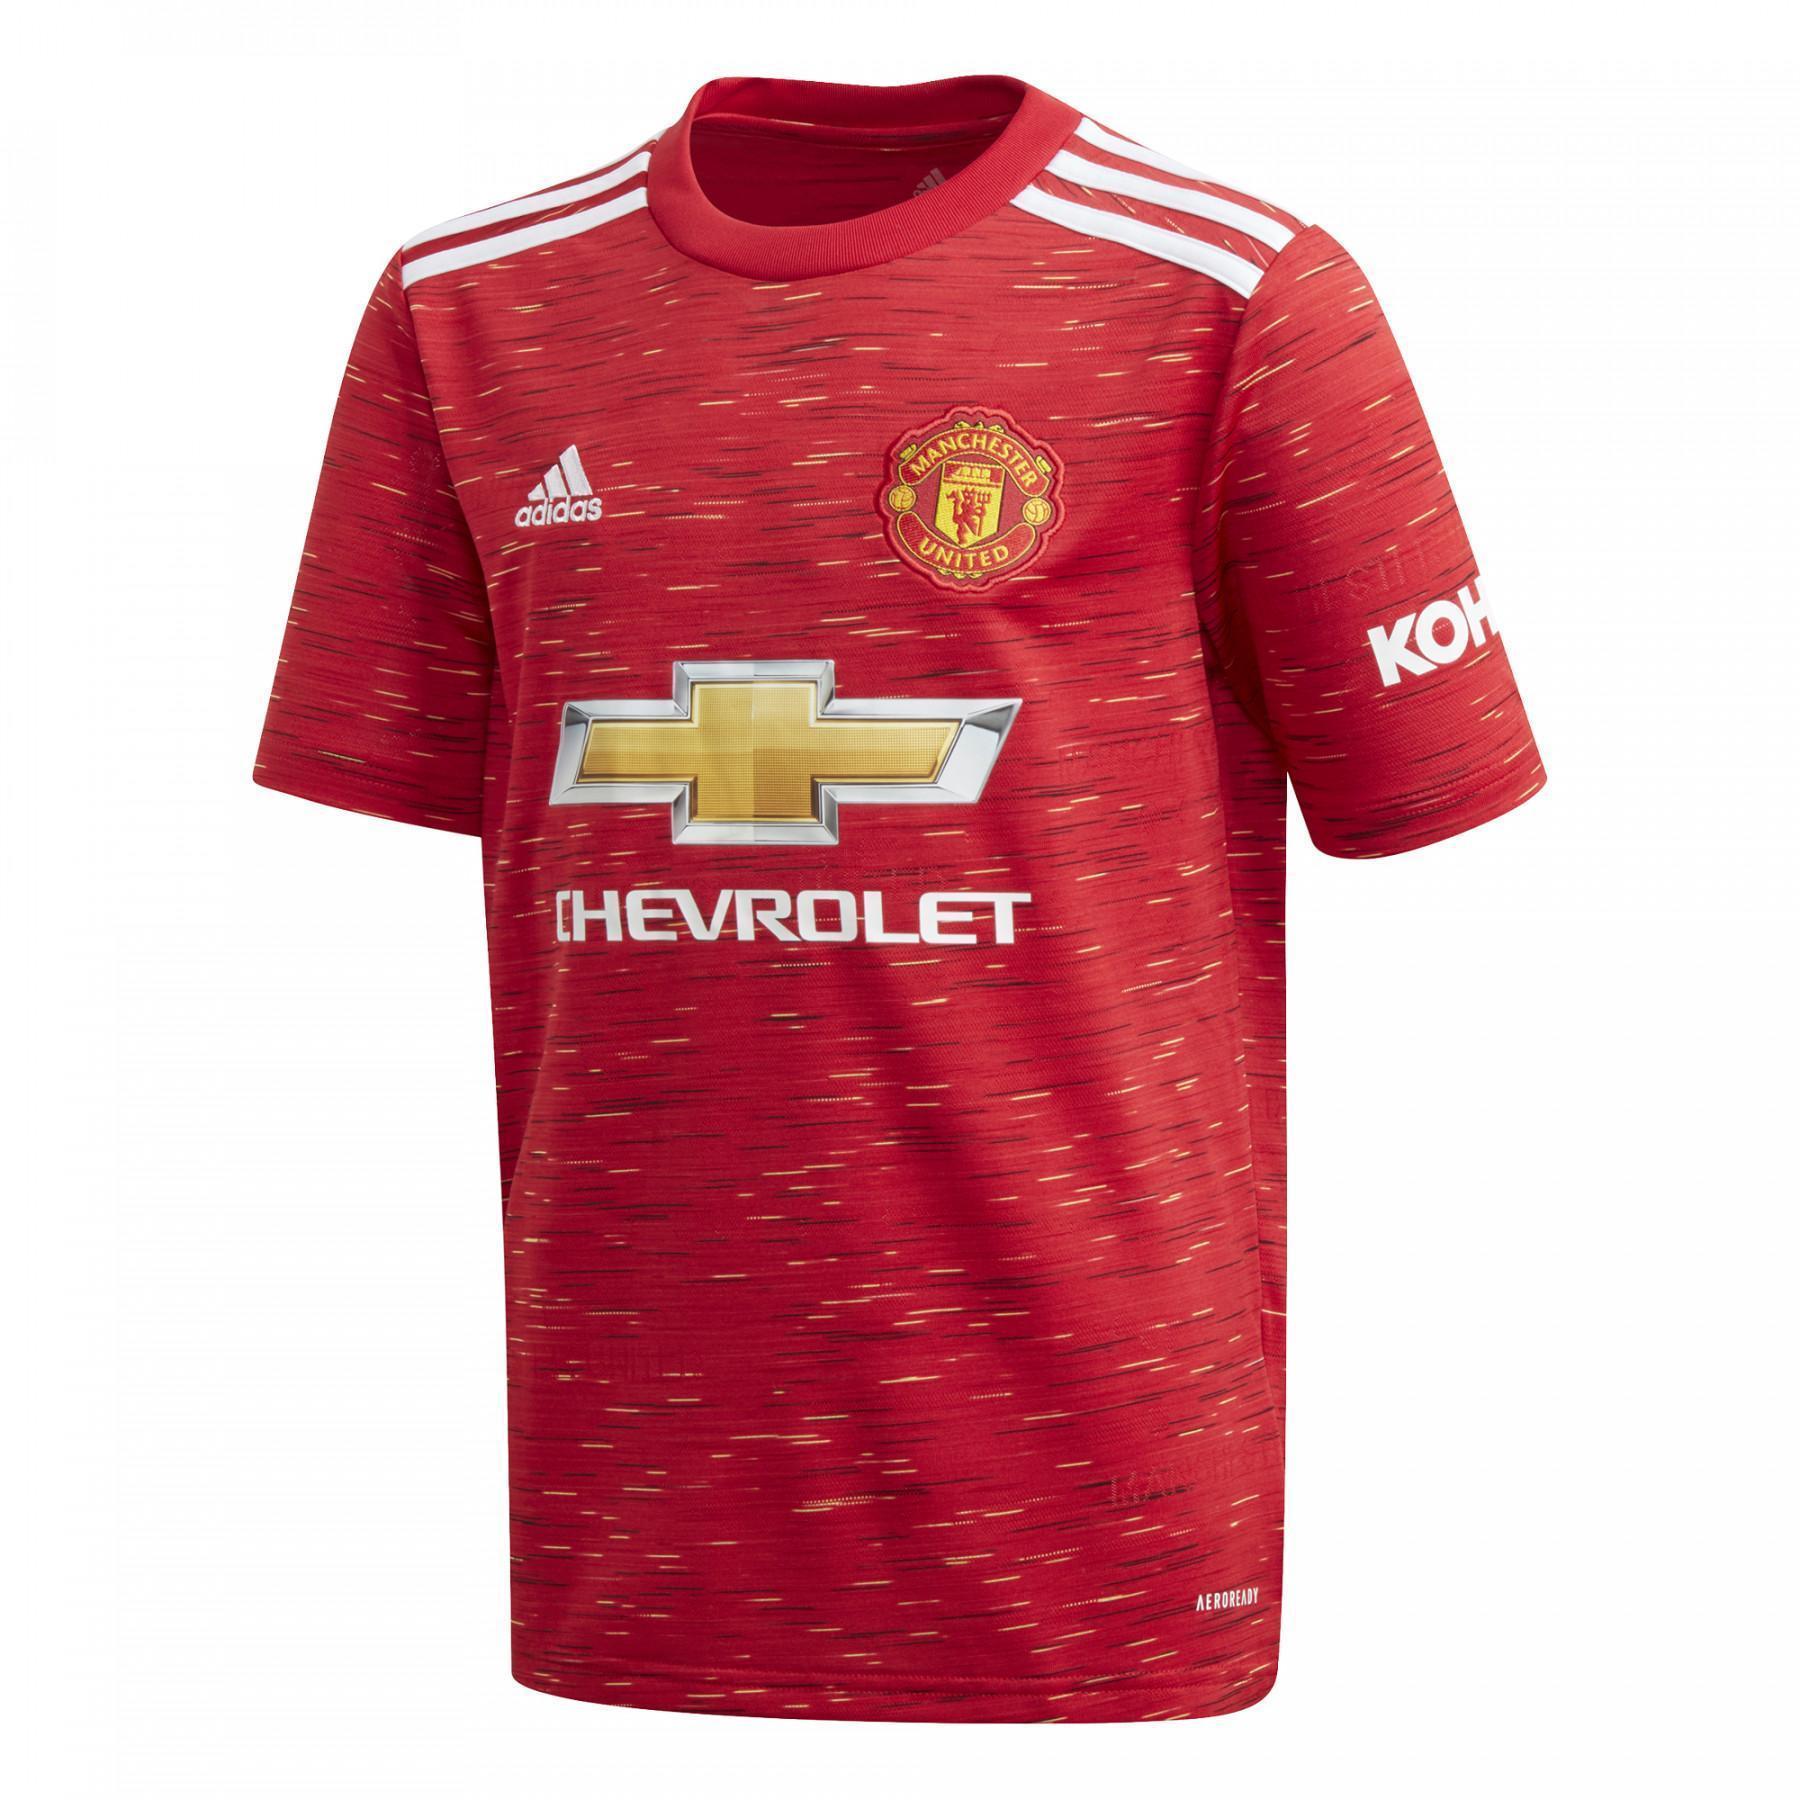 Children's home jersey Manchester United 2020/21